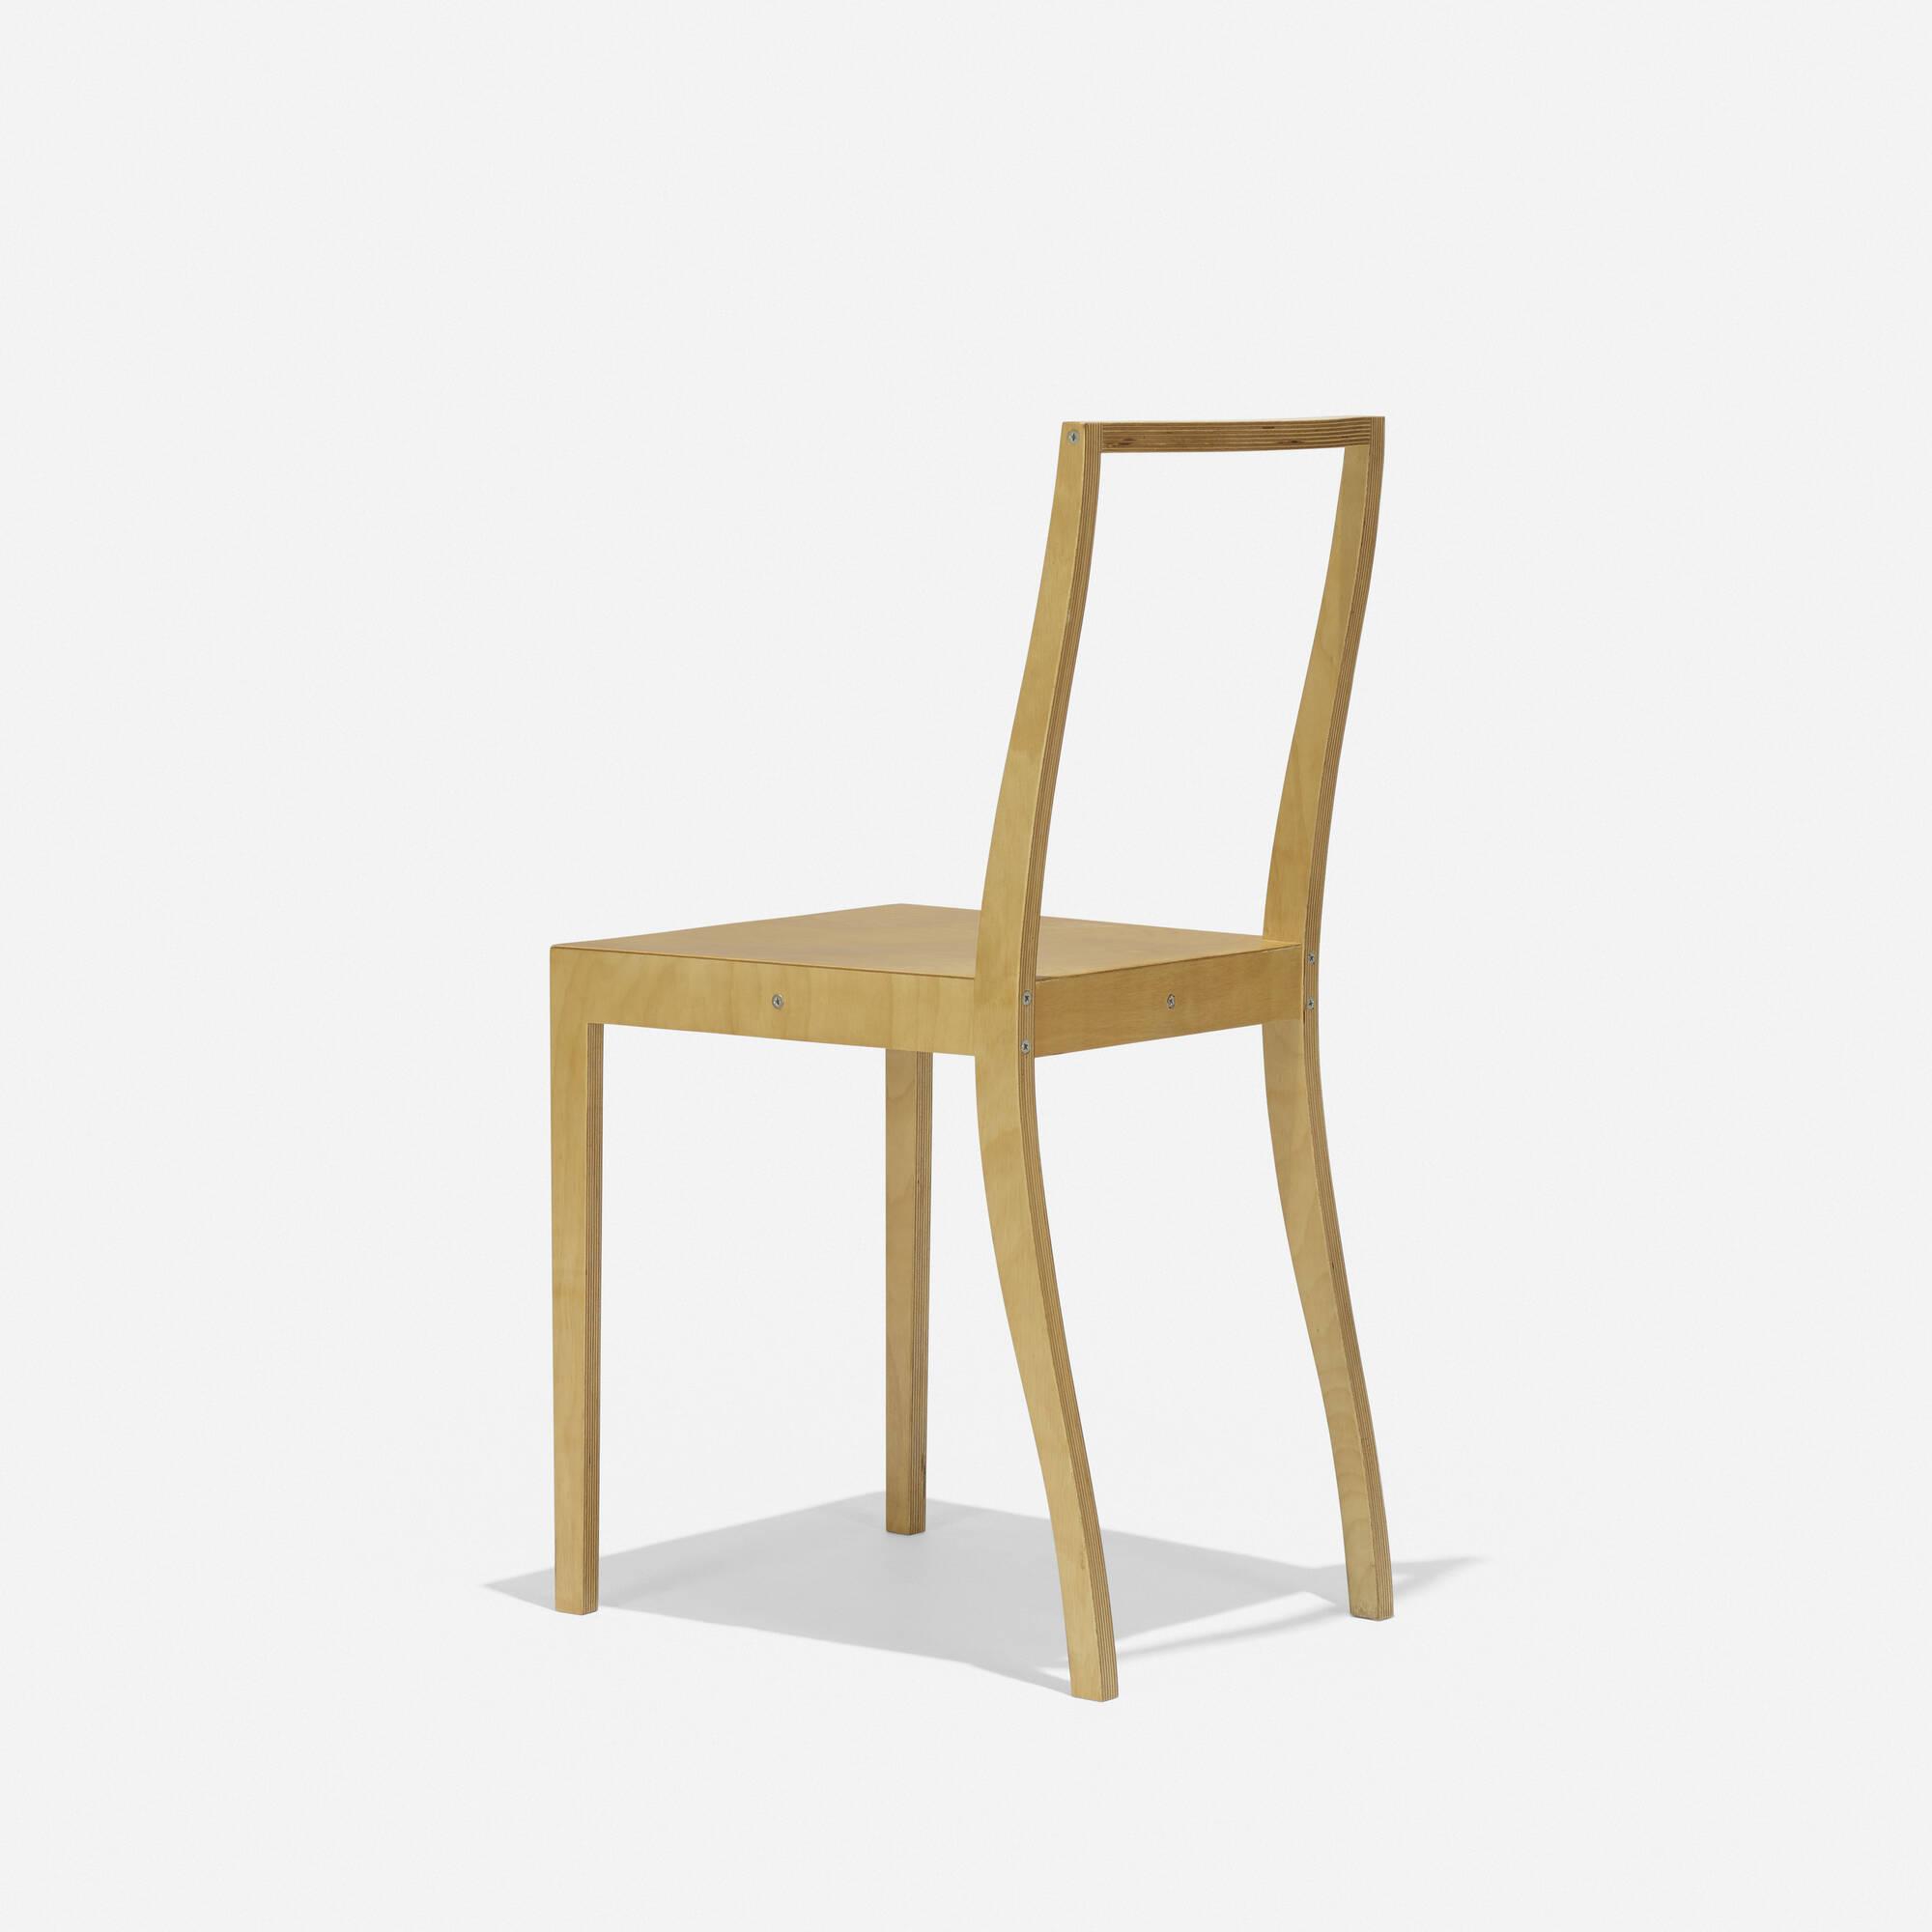 chair design museum galvanized steel chairs 342 jasper morrison ply